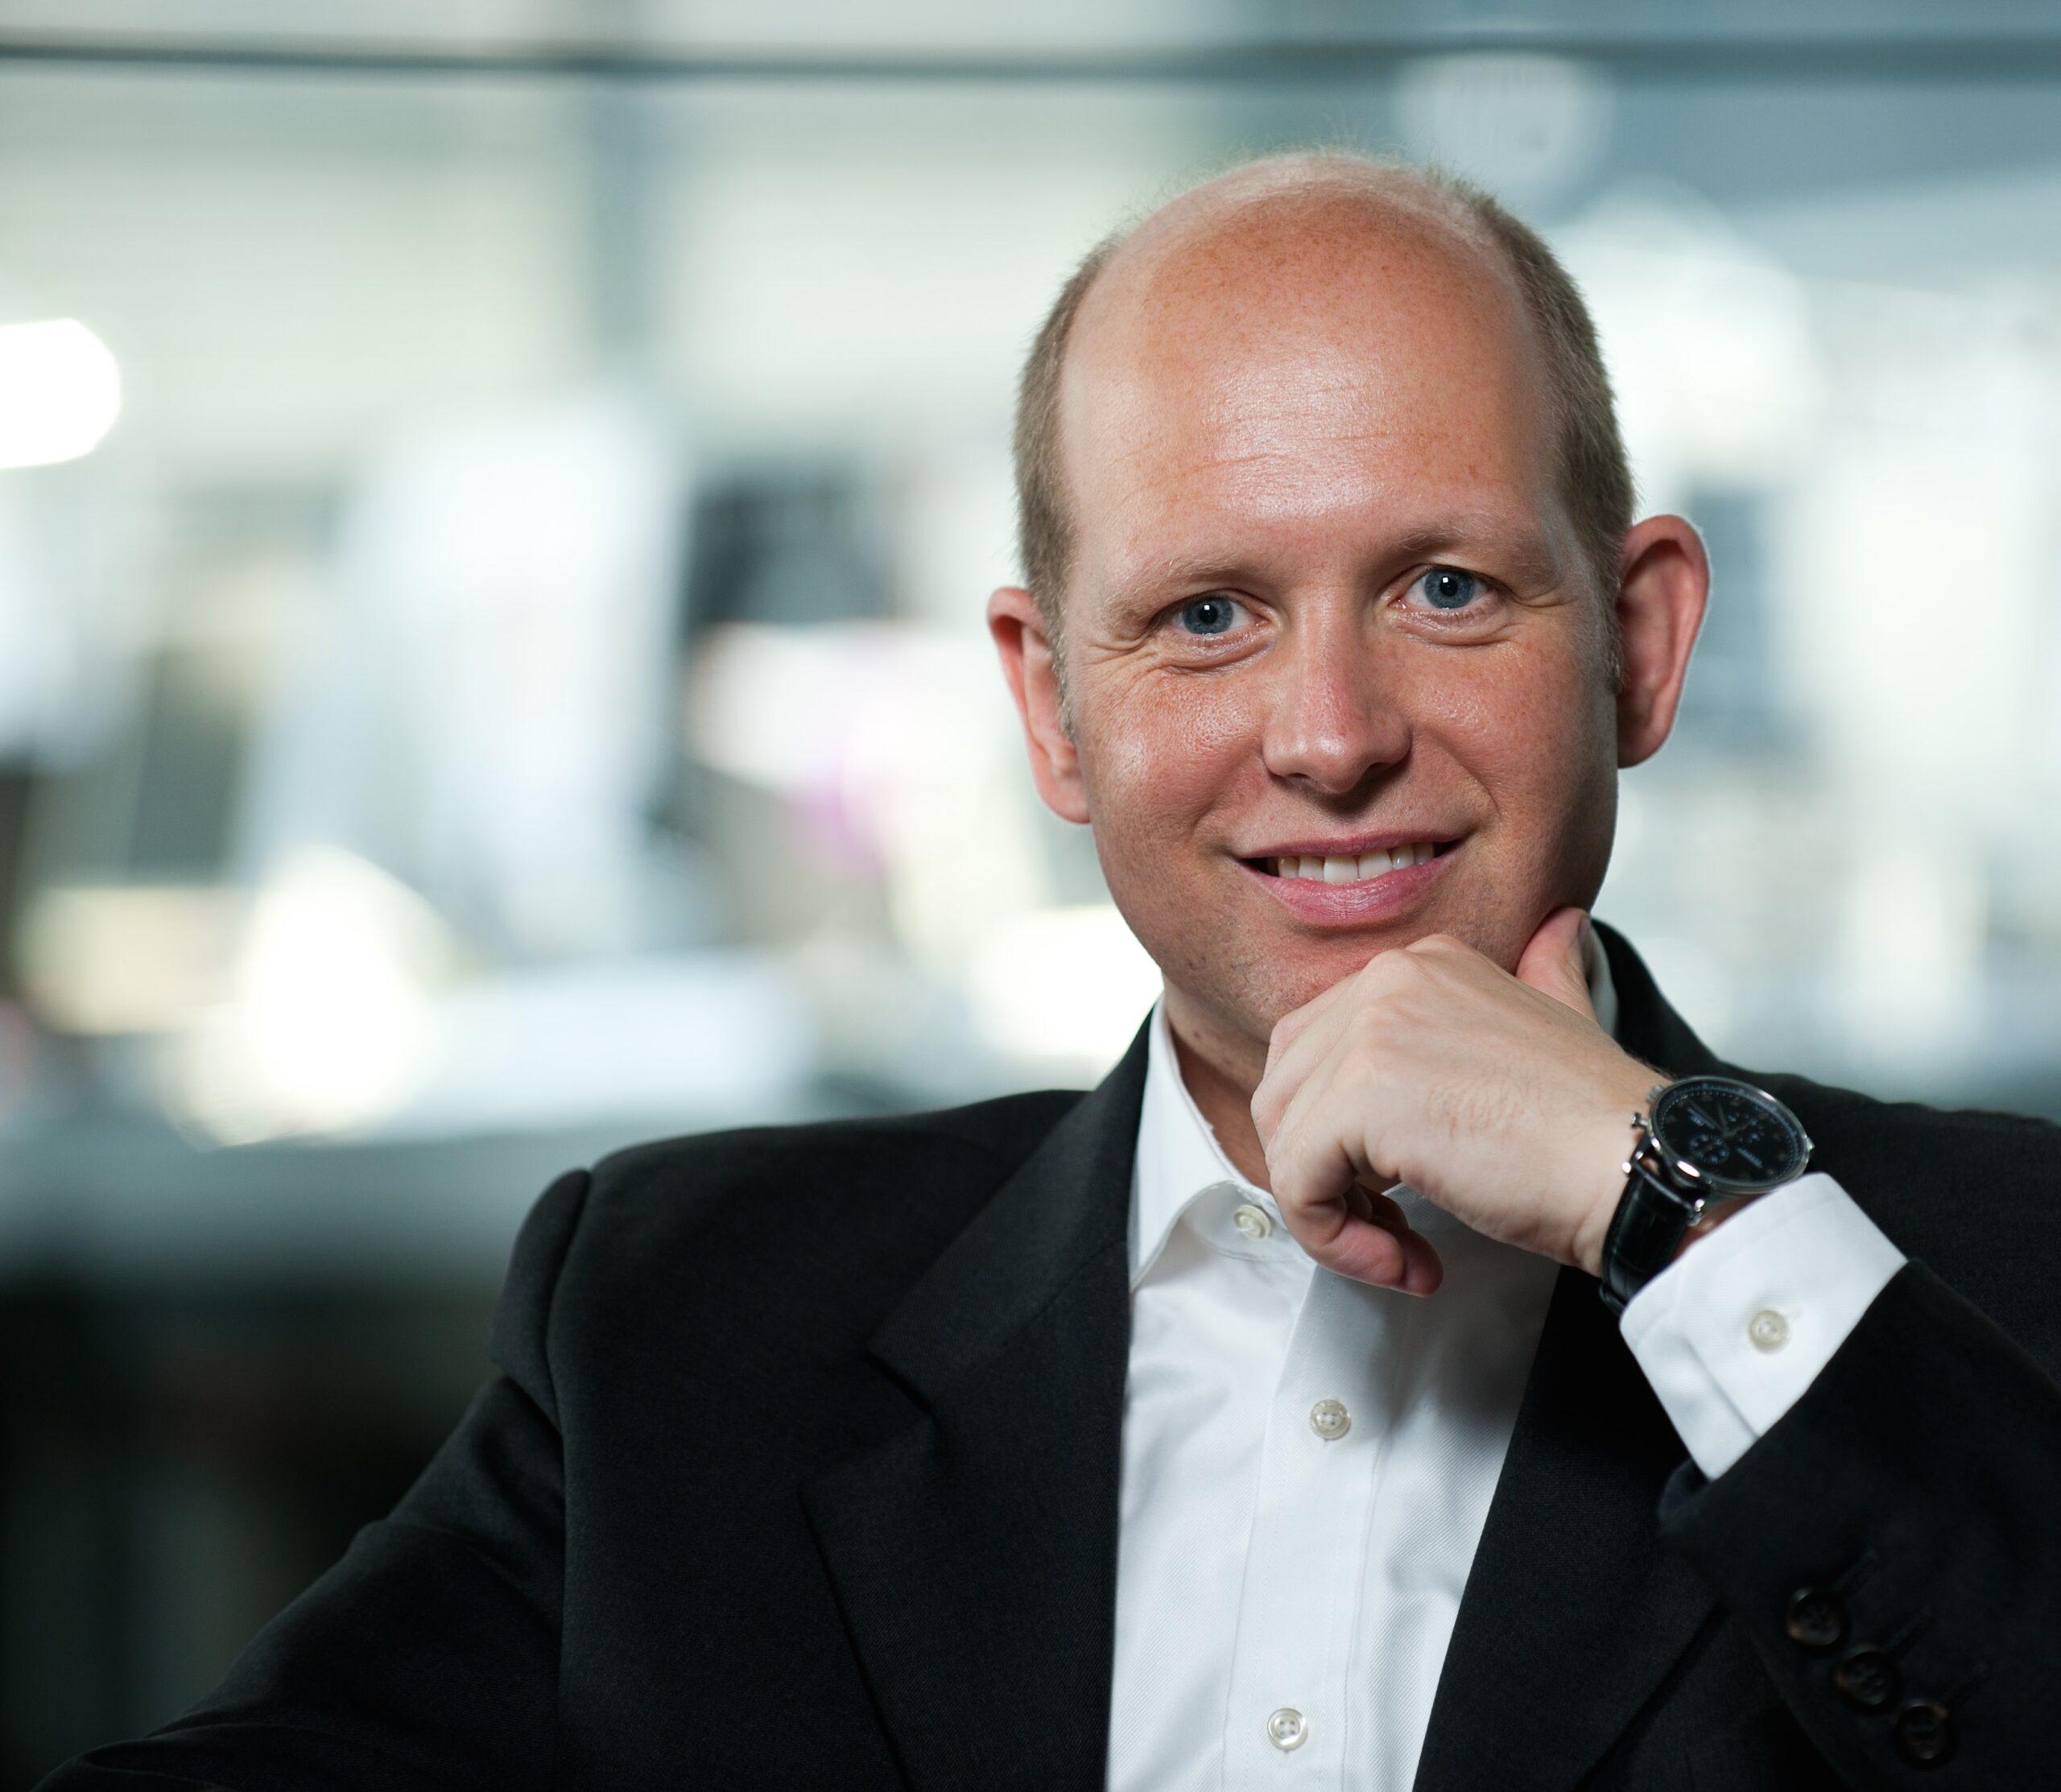 Andreas Kleiner